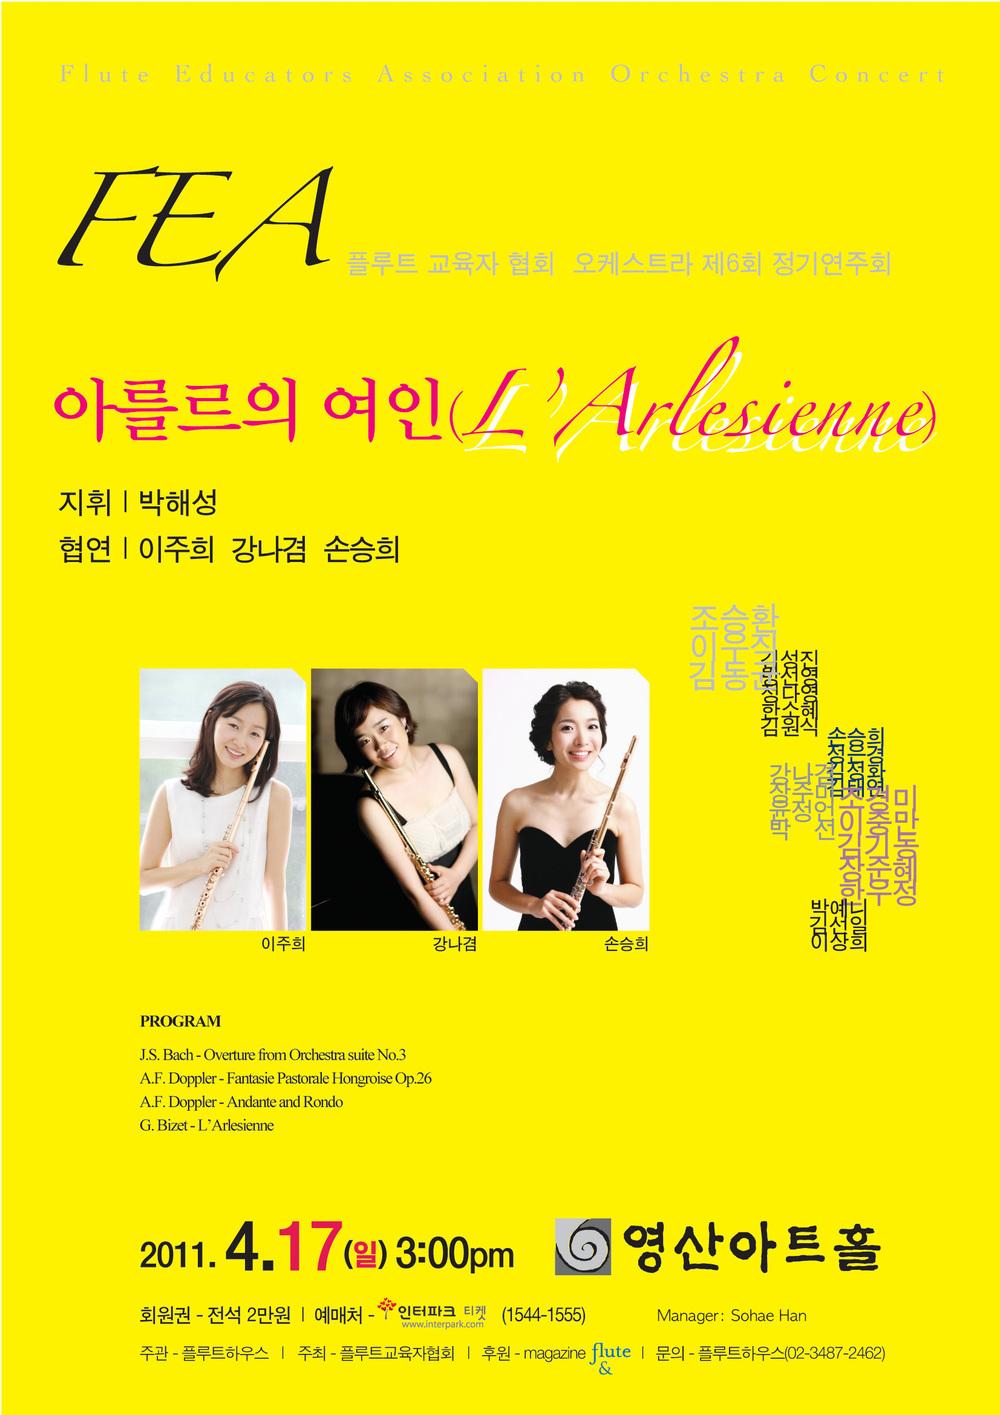 fea2011.jpg